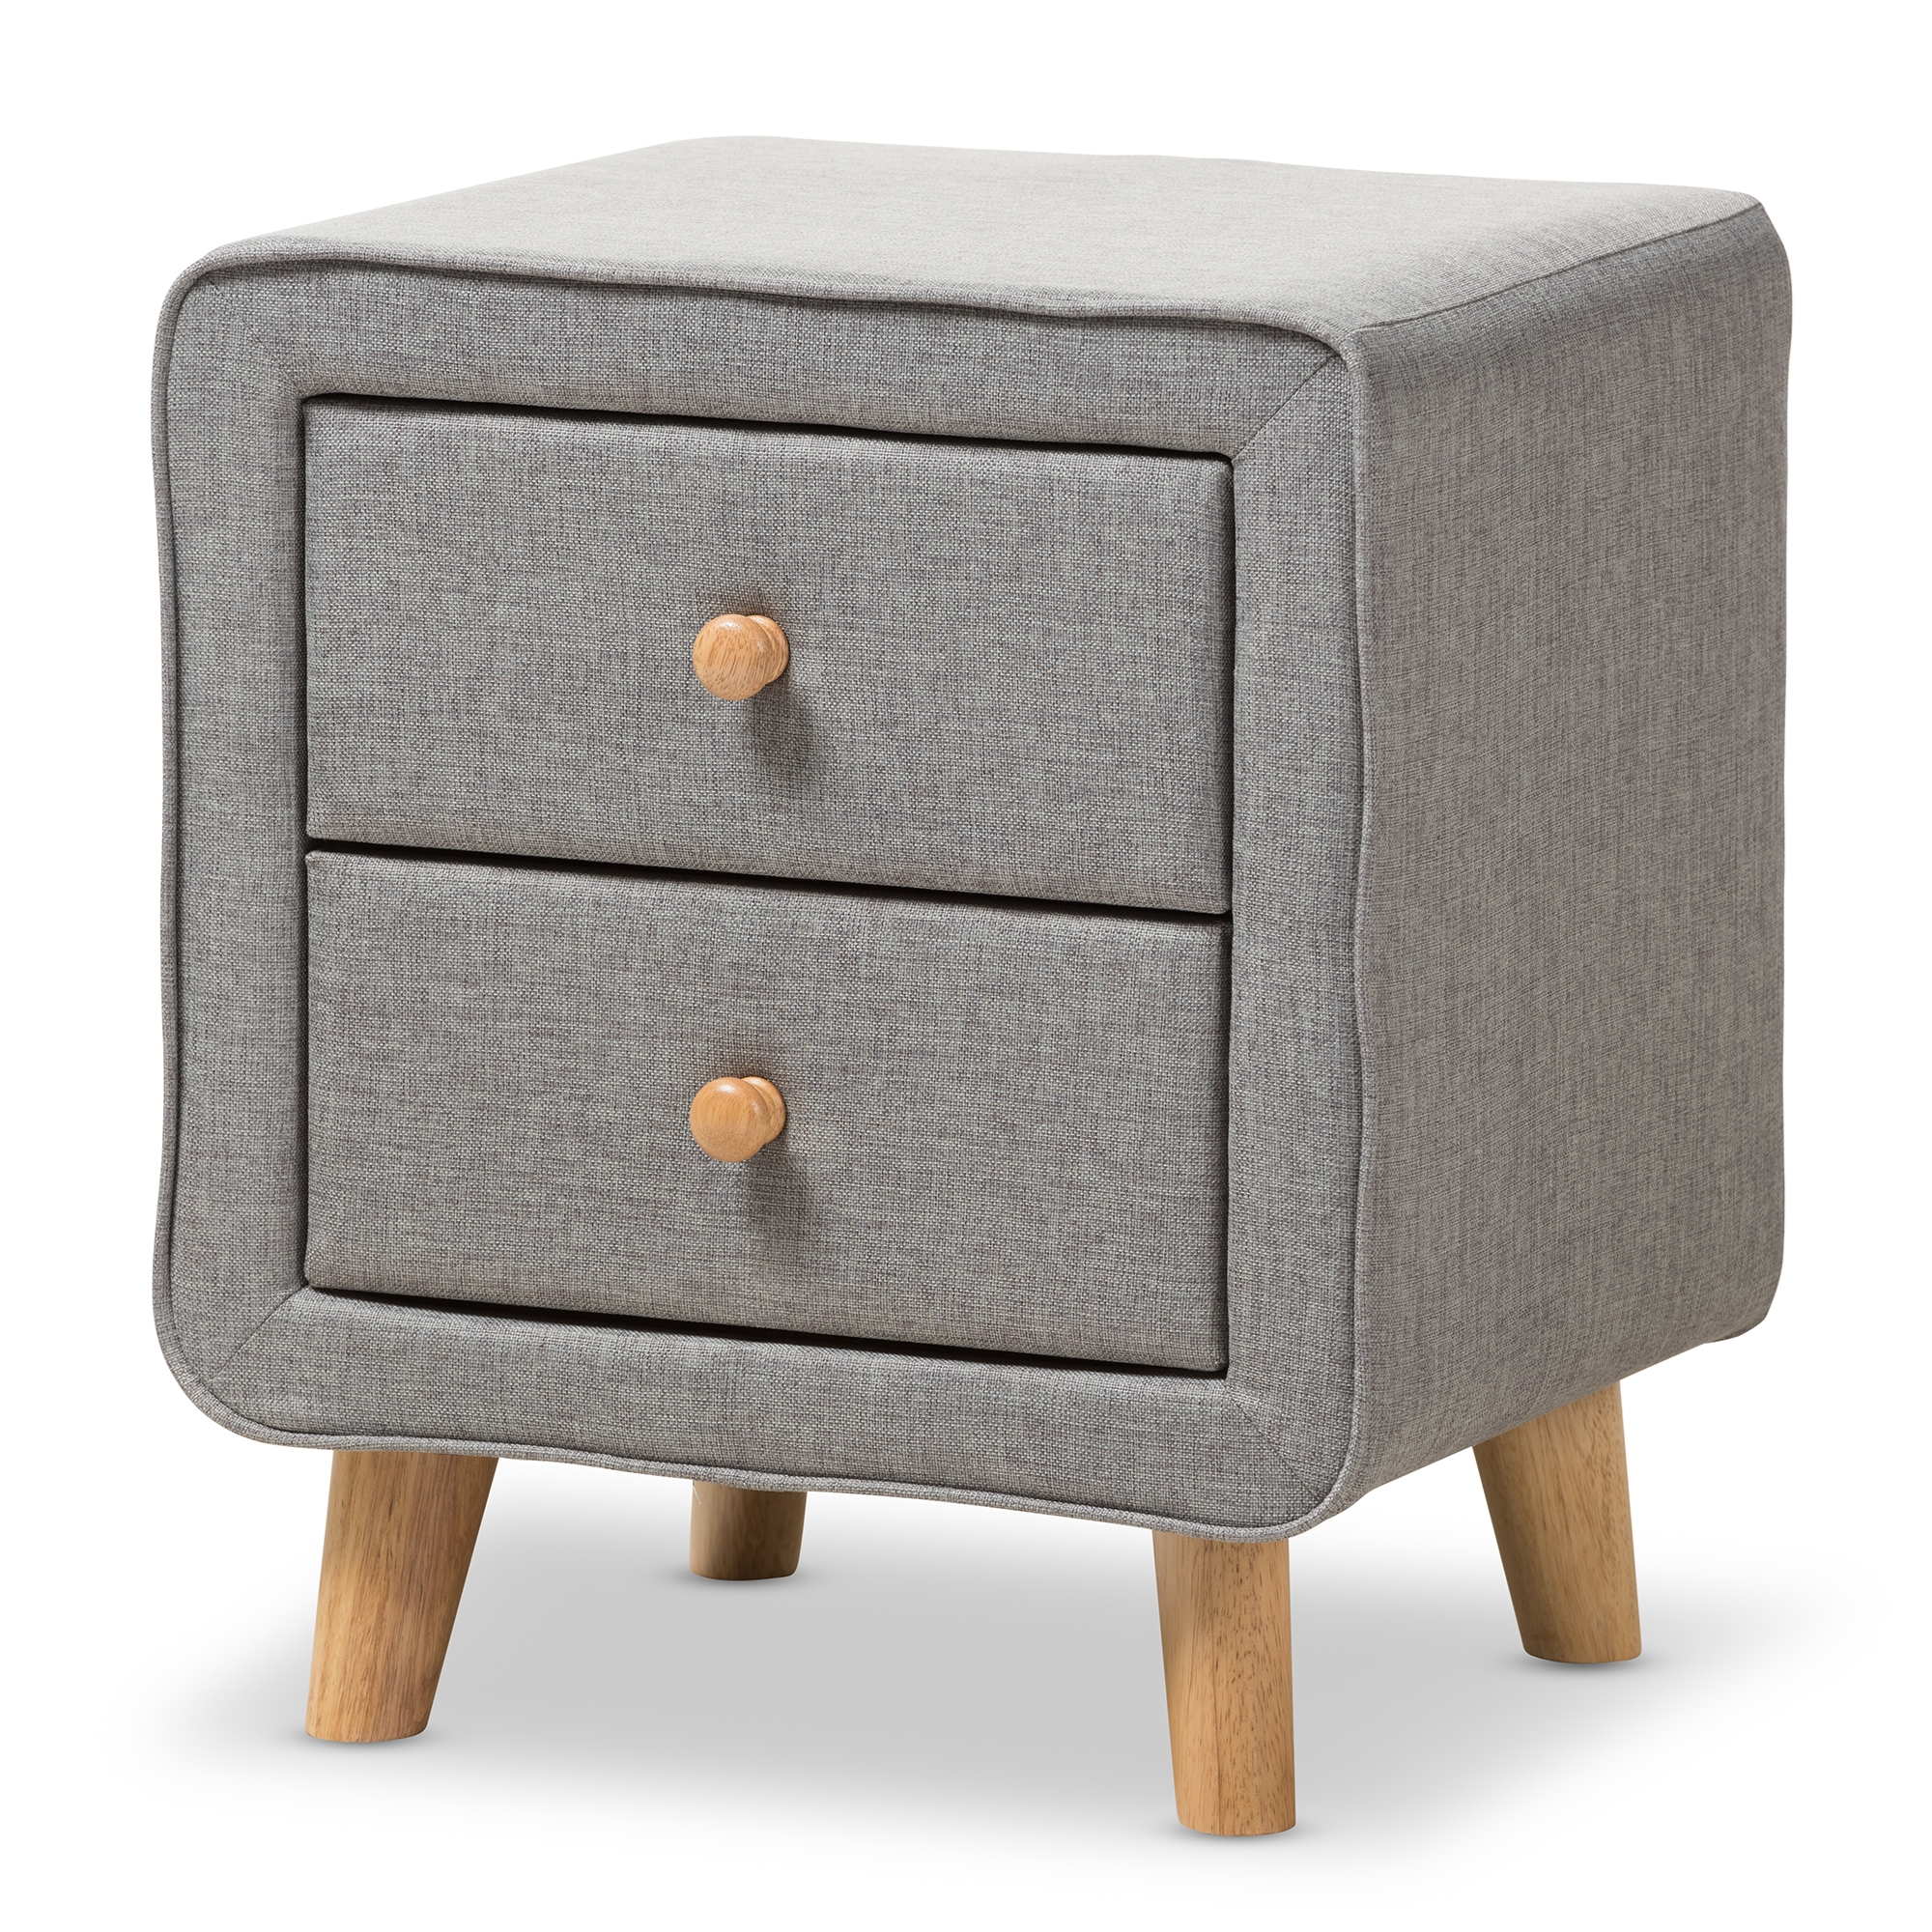 ... Bedroom Furniture U003e Wholesale Night Stands U003e. Baxton Studio Jonesy  Mid Century Grey Fabric Upholstered 2 Drawer Nightstand   BBT3140  ...